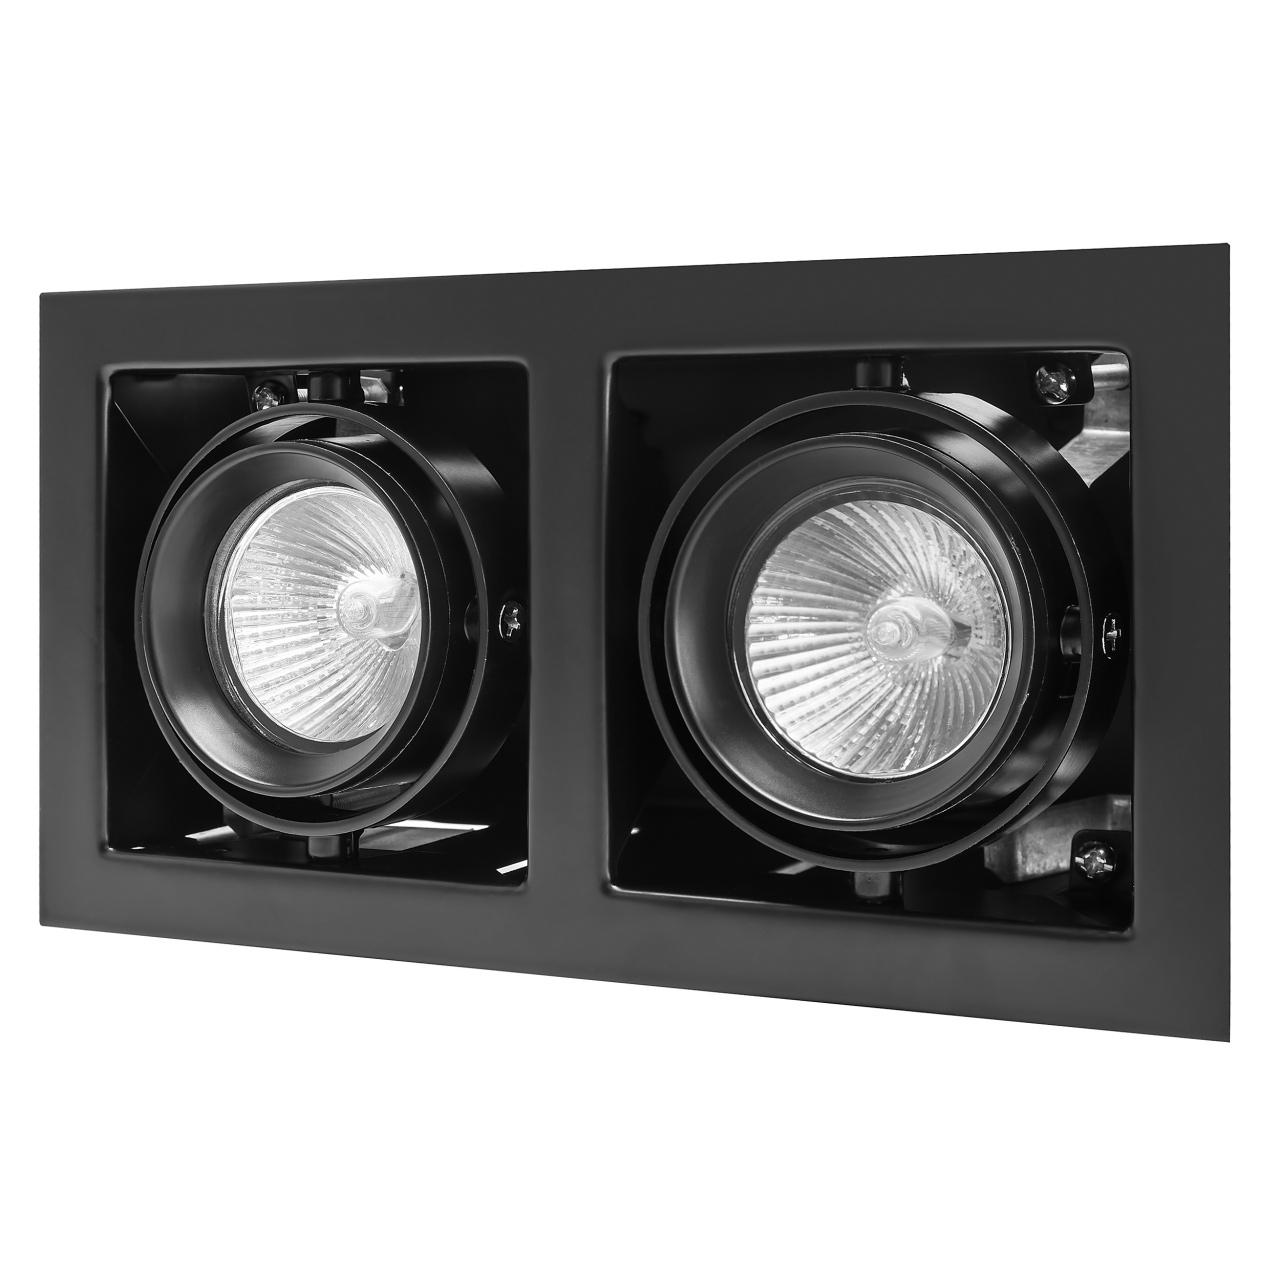 Светильник Cardano 16Х2 MR16 / HP16 черный Lightstar 214028